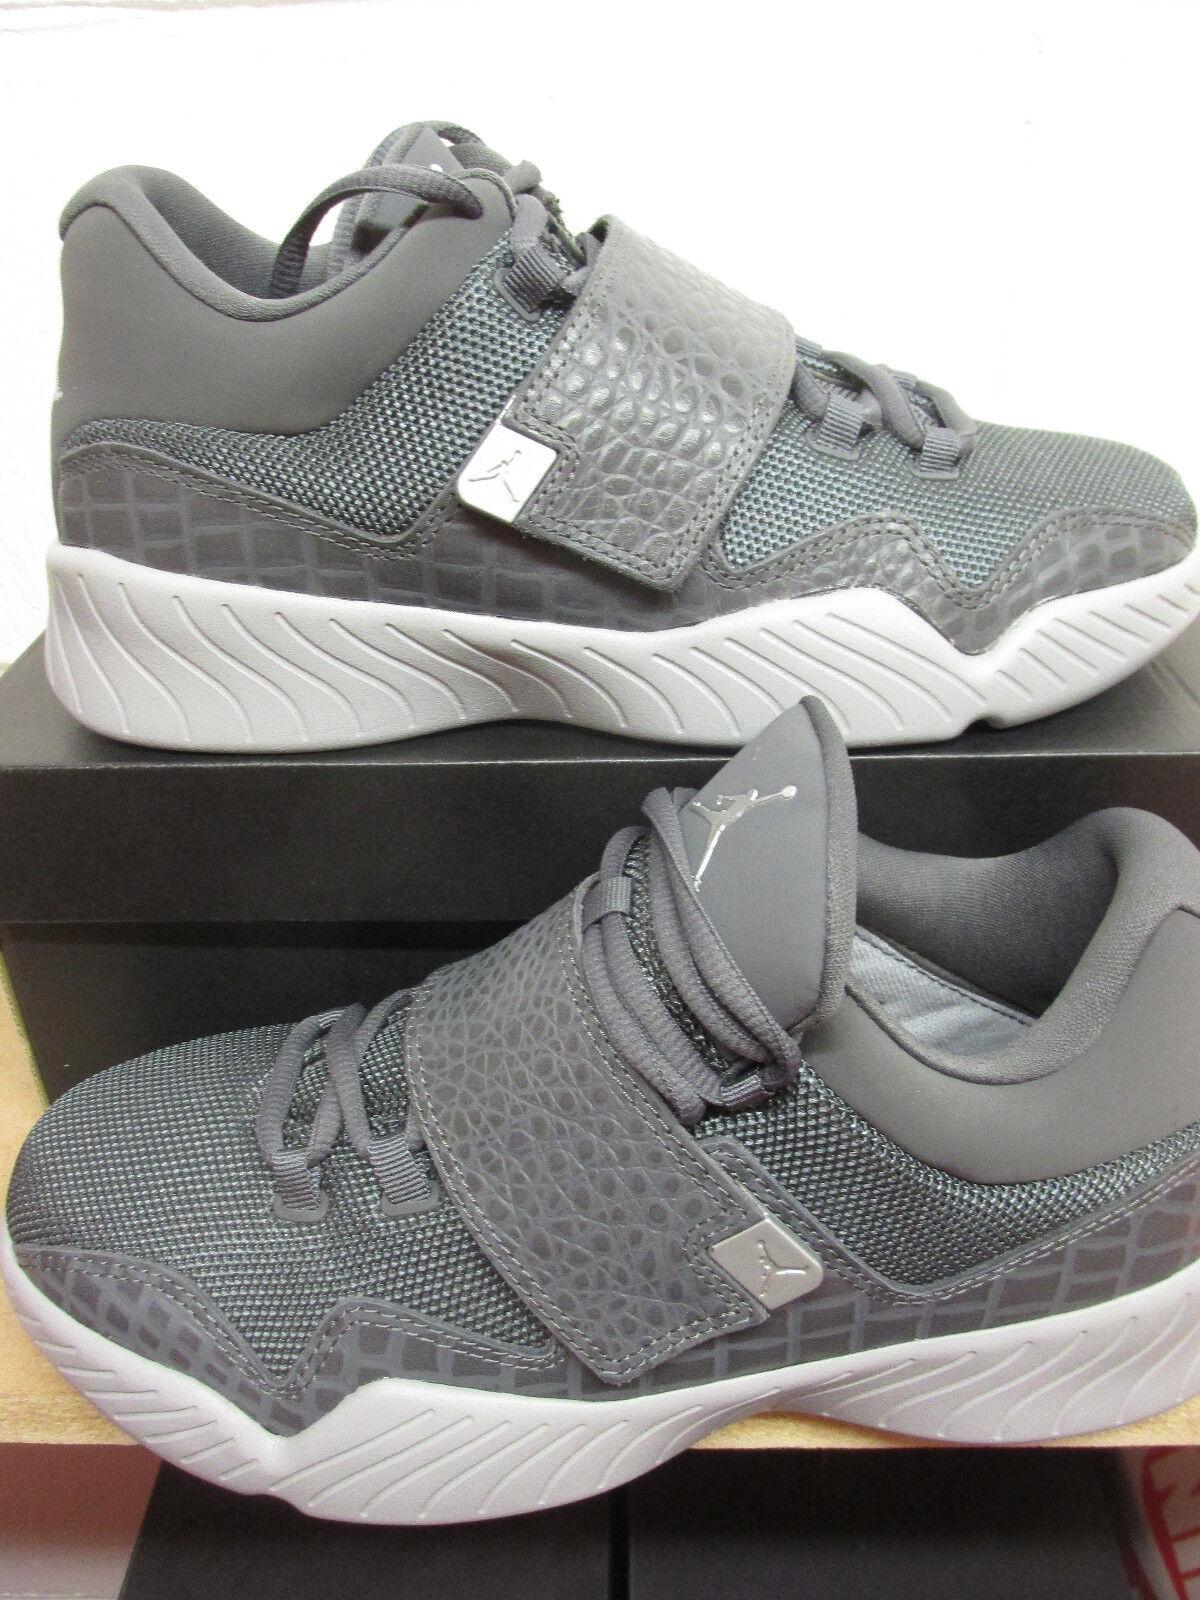 Nike Air Jordan J23 Herren Basketball Schuhe 854557 002 Turnschuhe